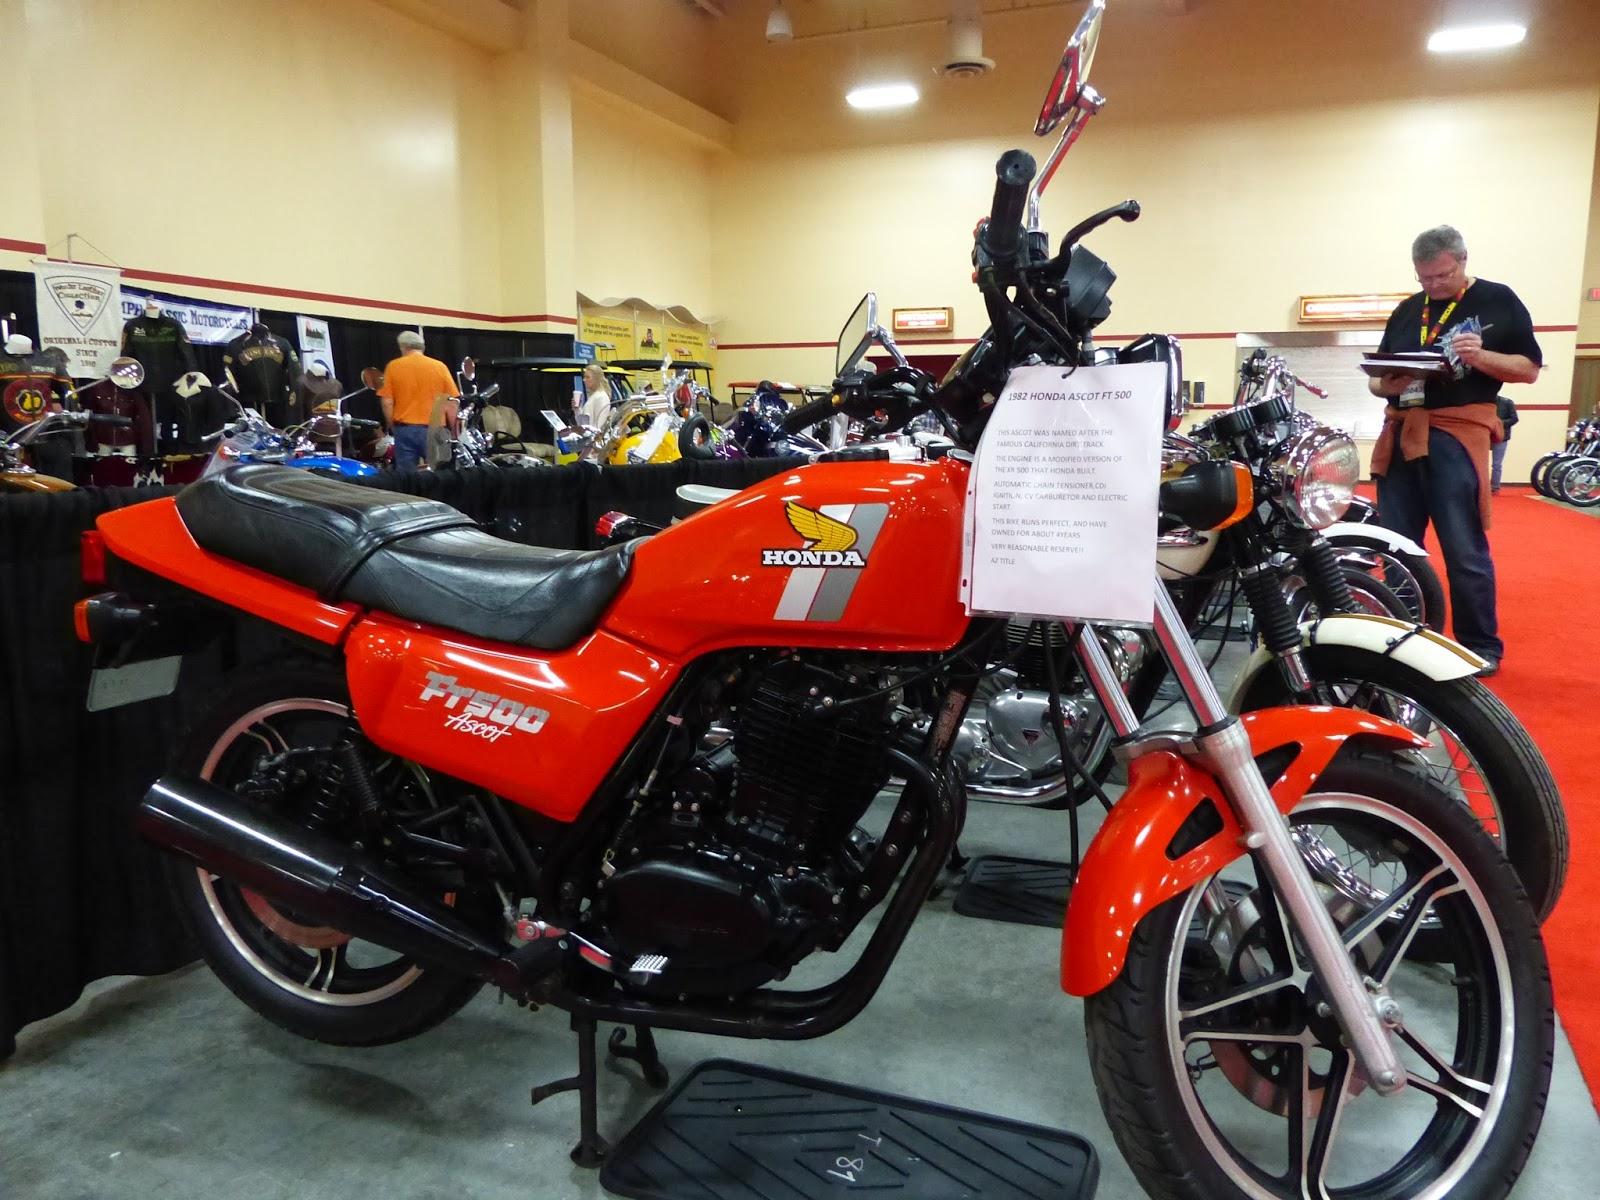 OldMotoDude: 1982 Honda FT500 Ascot sold for $2,500 at the ...